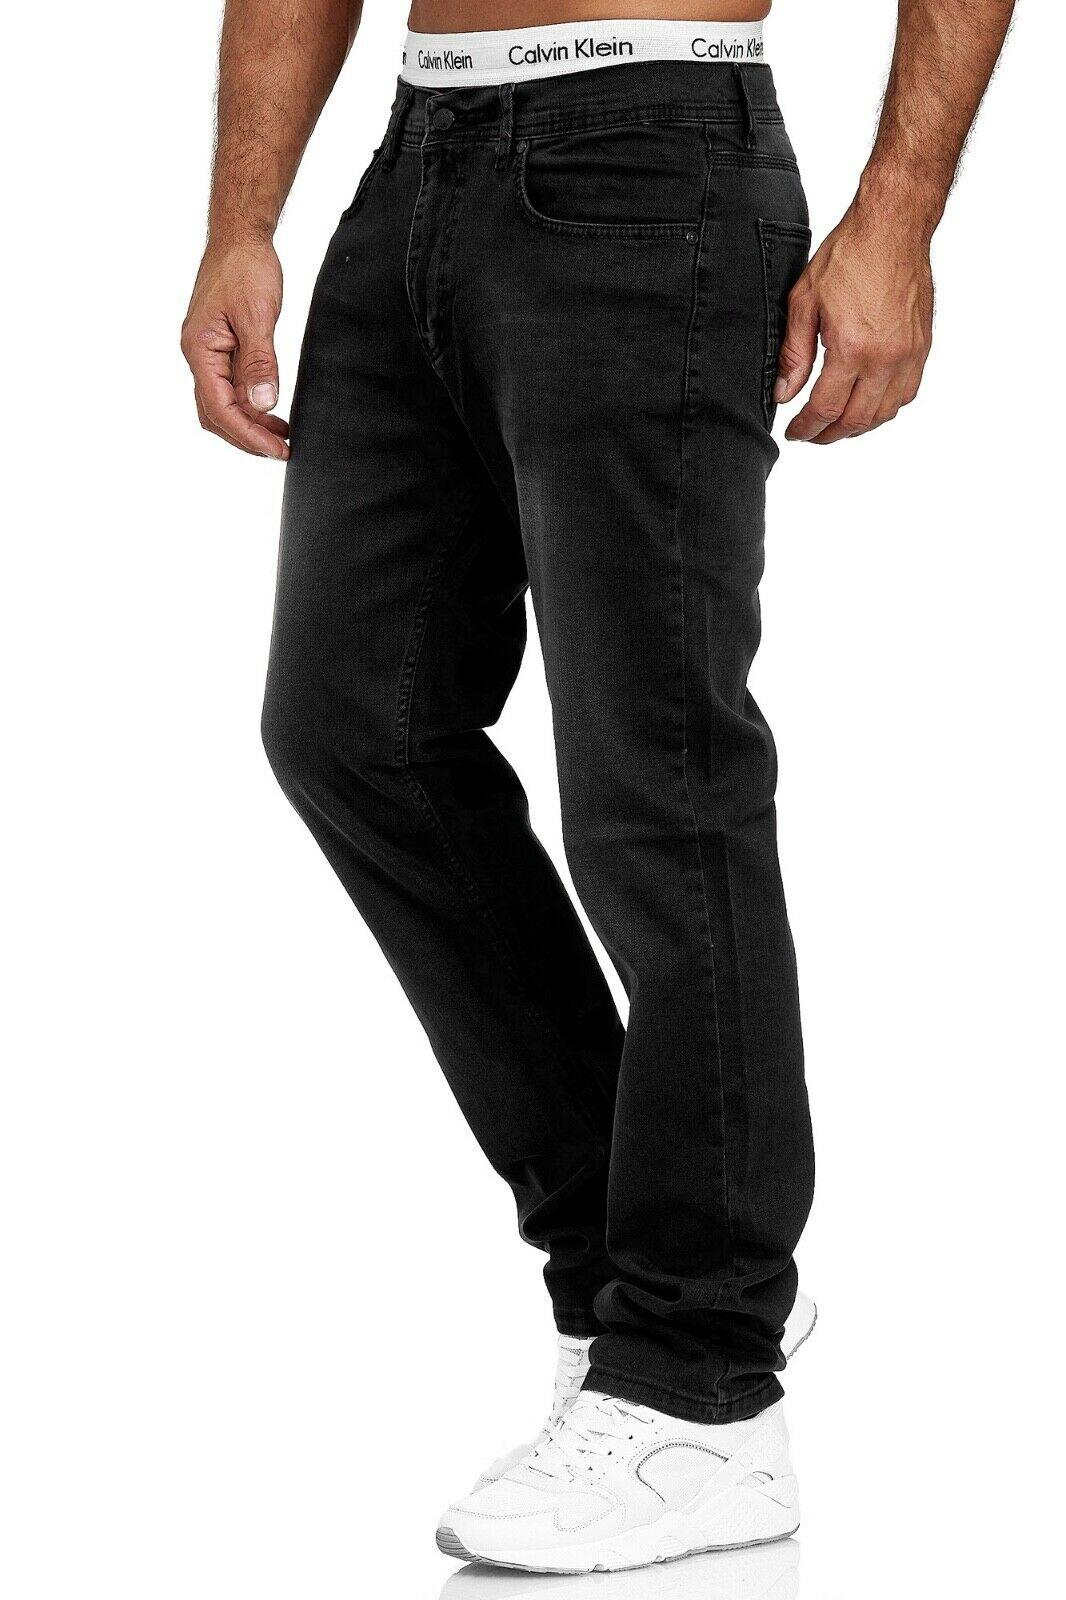 Herren-Jeans-Hose-Denim-KC-Black-Washed-Straight-Cut-Regular-Dicke-Naht-naehte Indexbild 52